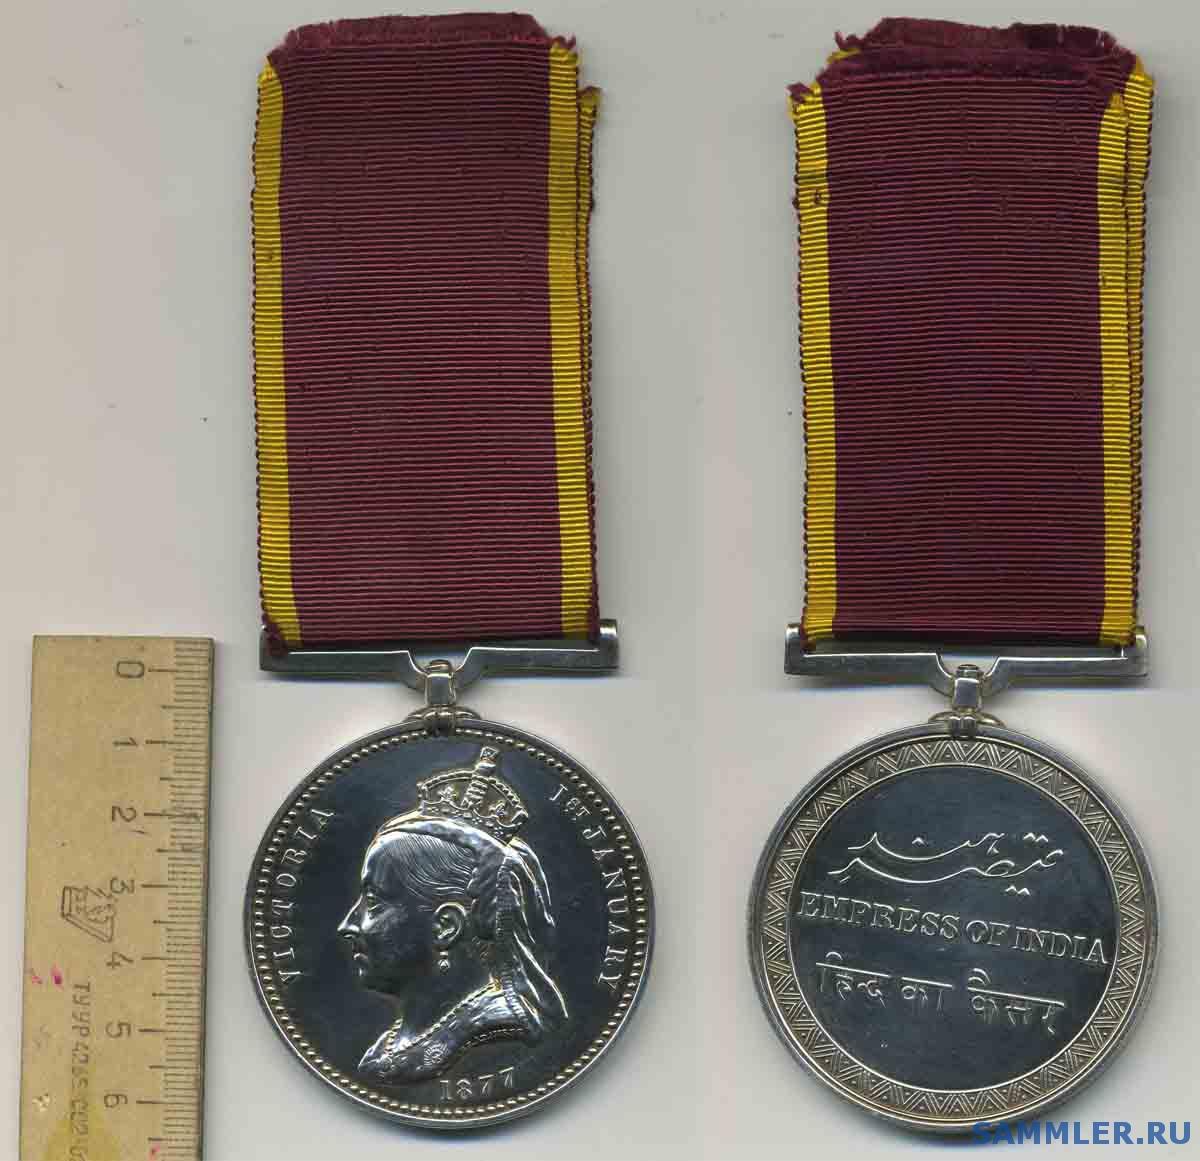 Empress_of_India_Medal_1877.jpg